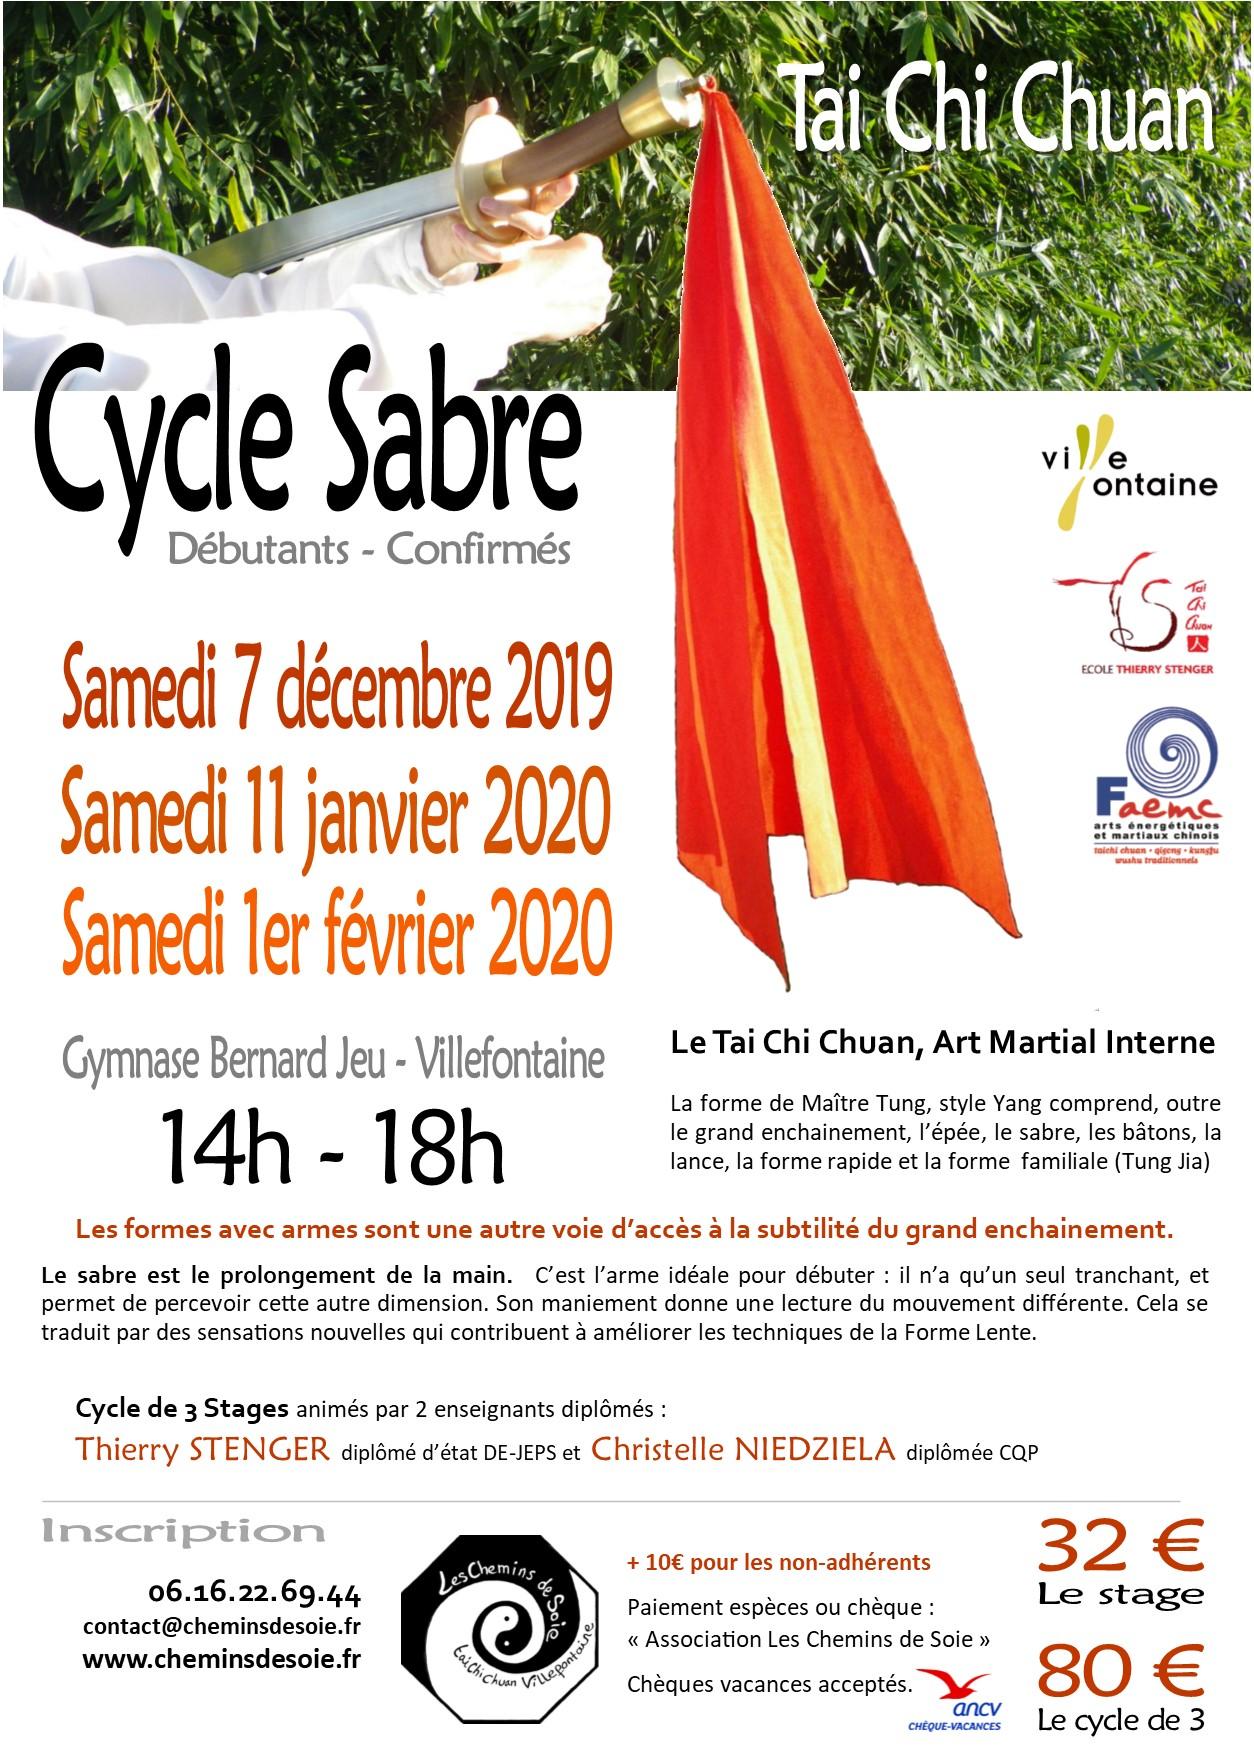 cyclesabre2019-20